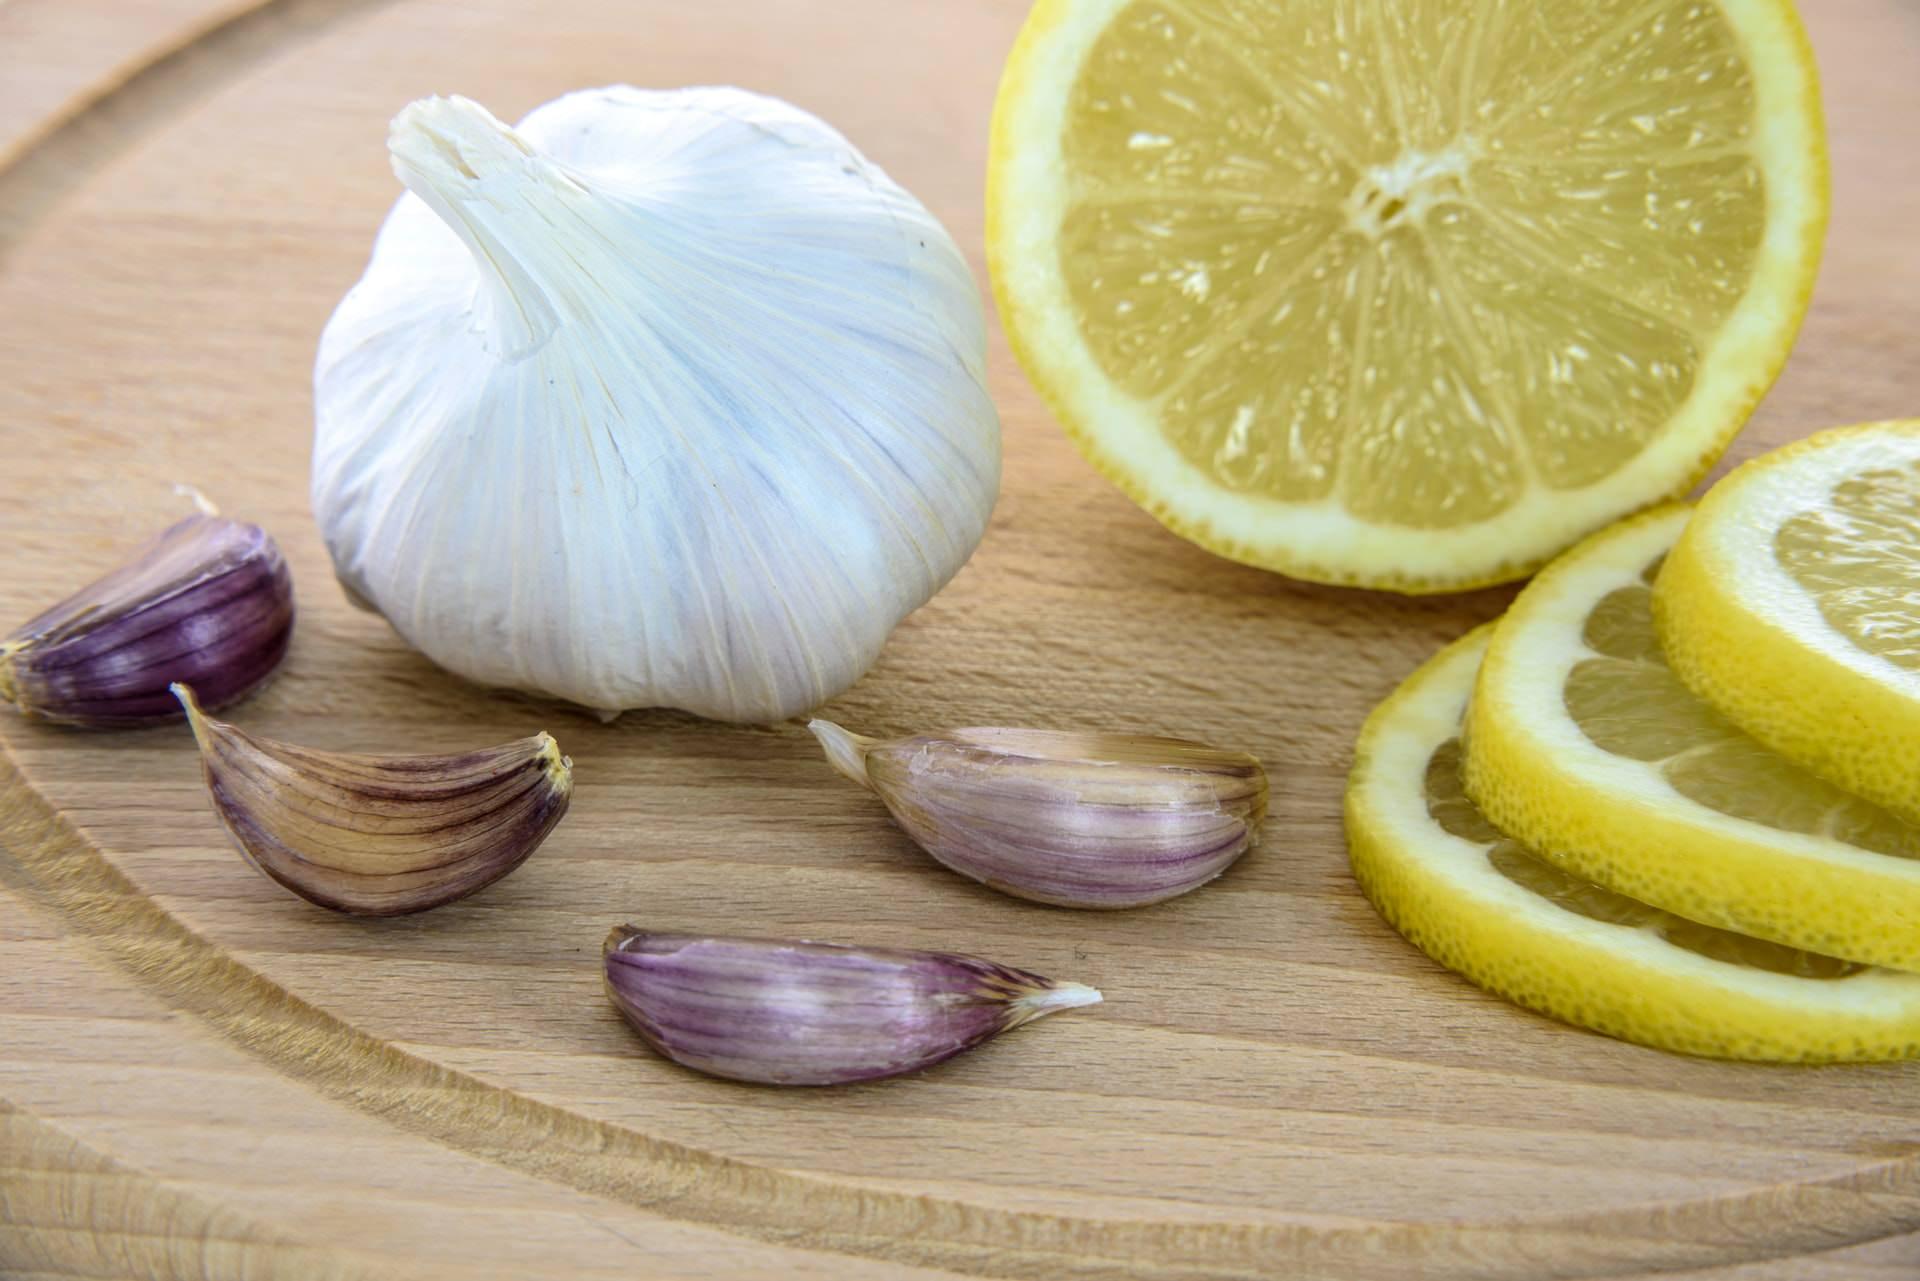 peeled garlic lemon healthy cutting board stock